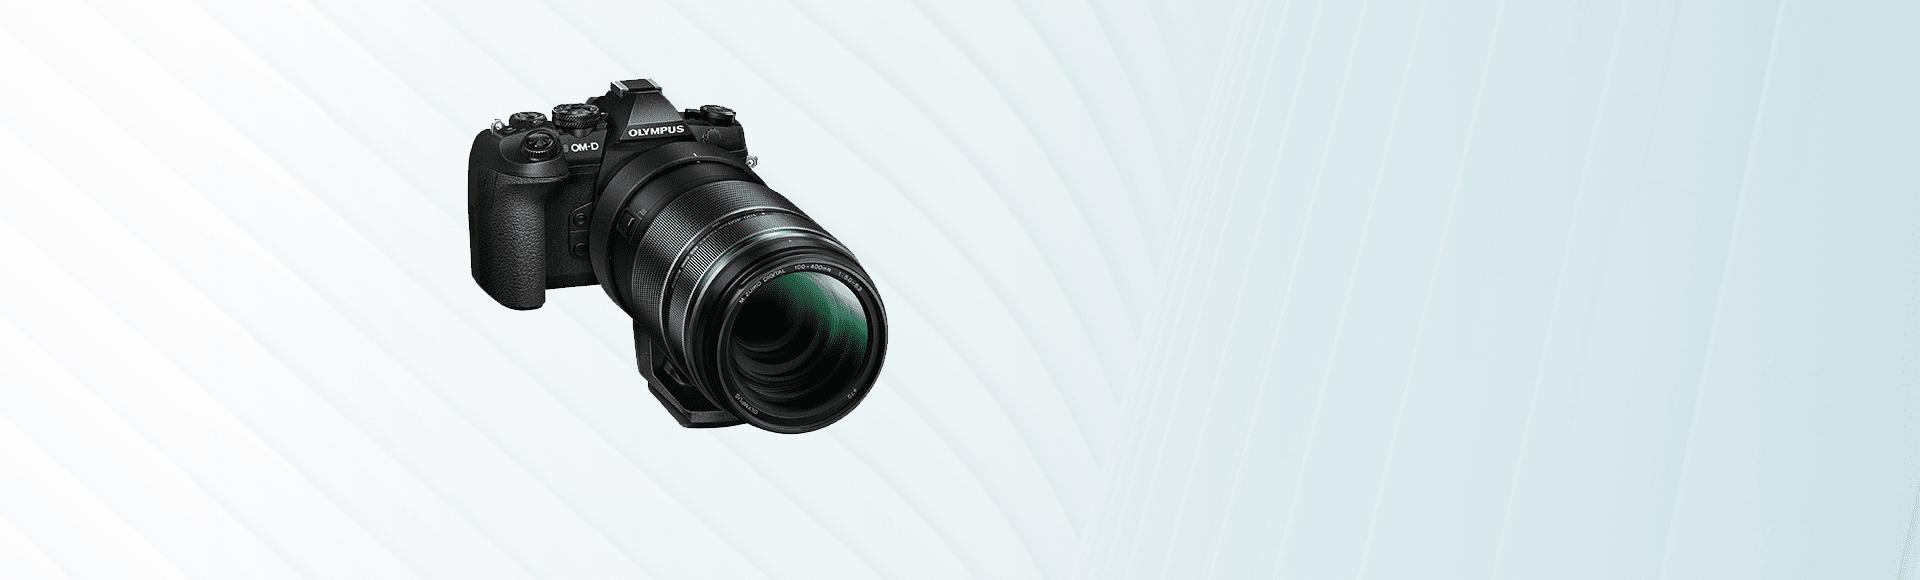 M. Zuiko ED 100-400mm F5.0-6.3 IS Lens